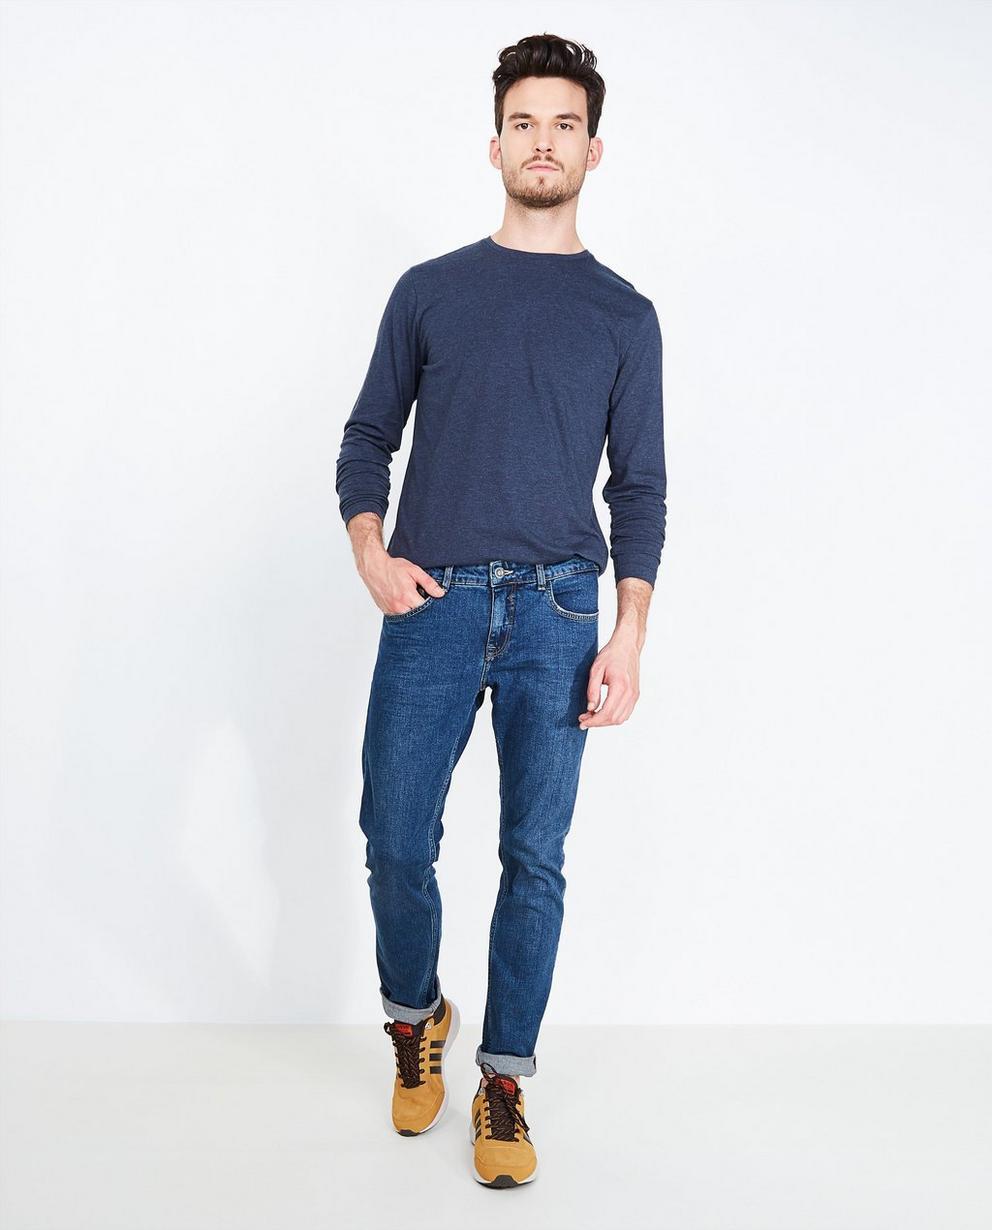 Jeans bleu foncé - slim fit - Quarterback